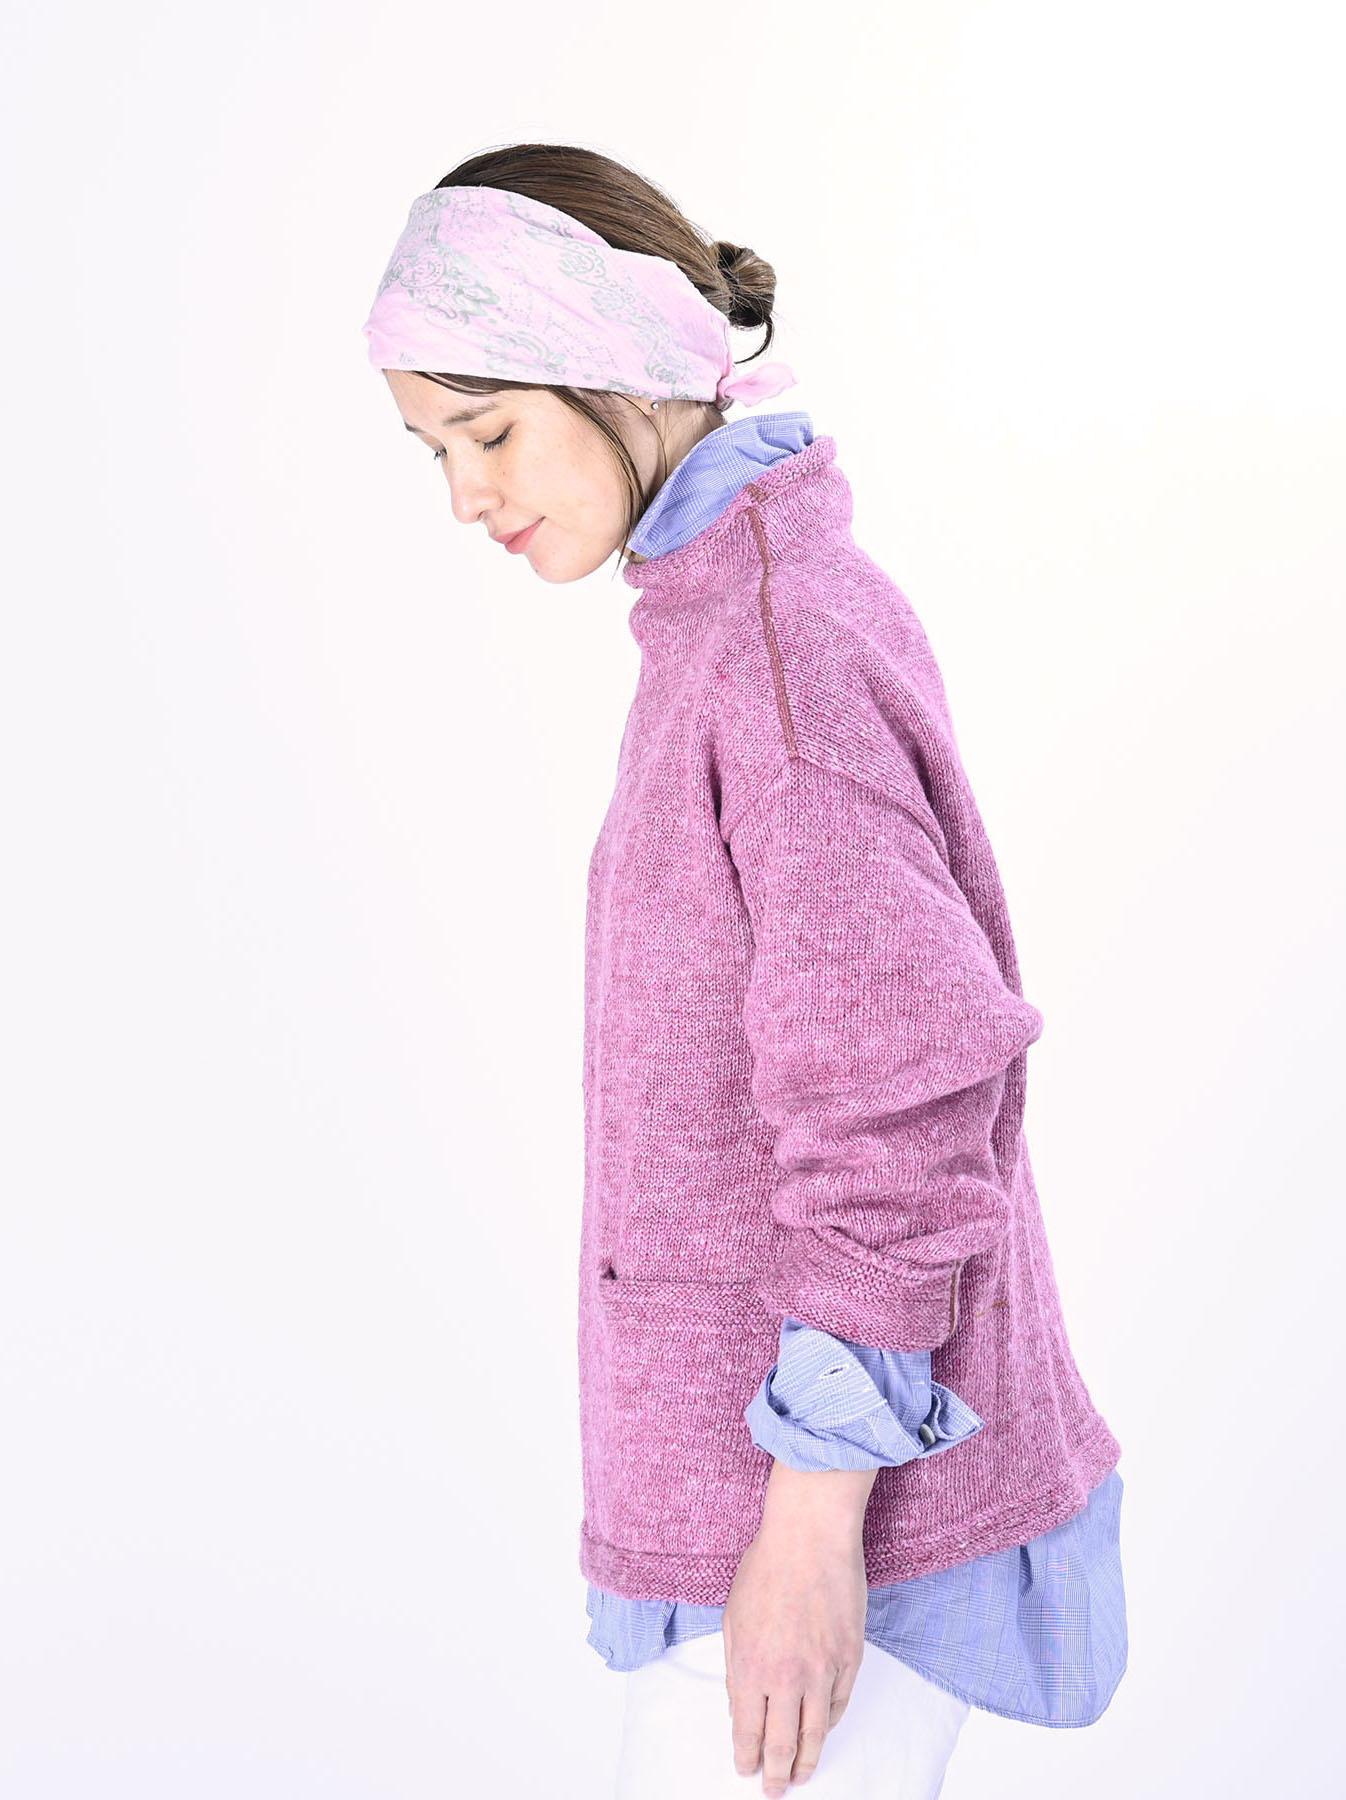 WH Linen Tweed Knit-sew 908 Umahiko Sweater (0321)-7